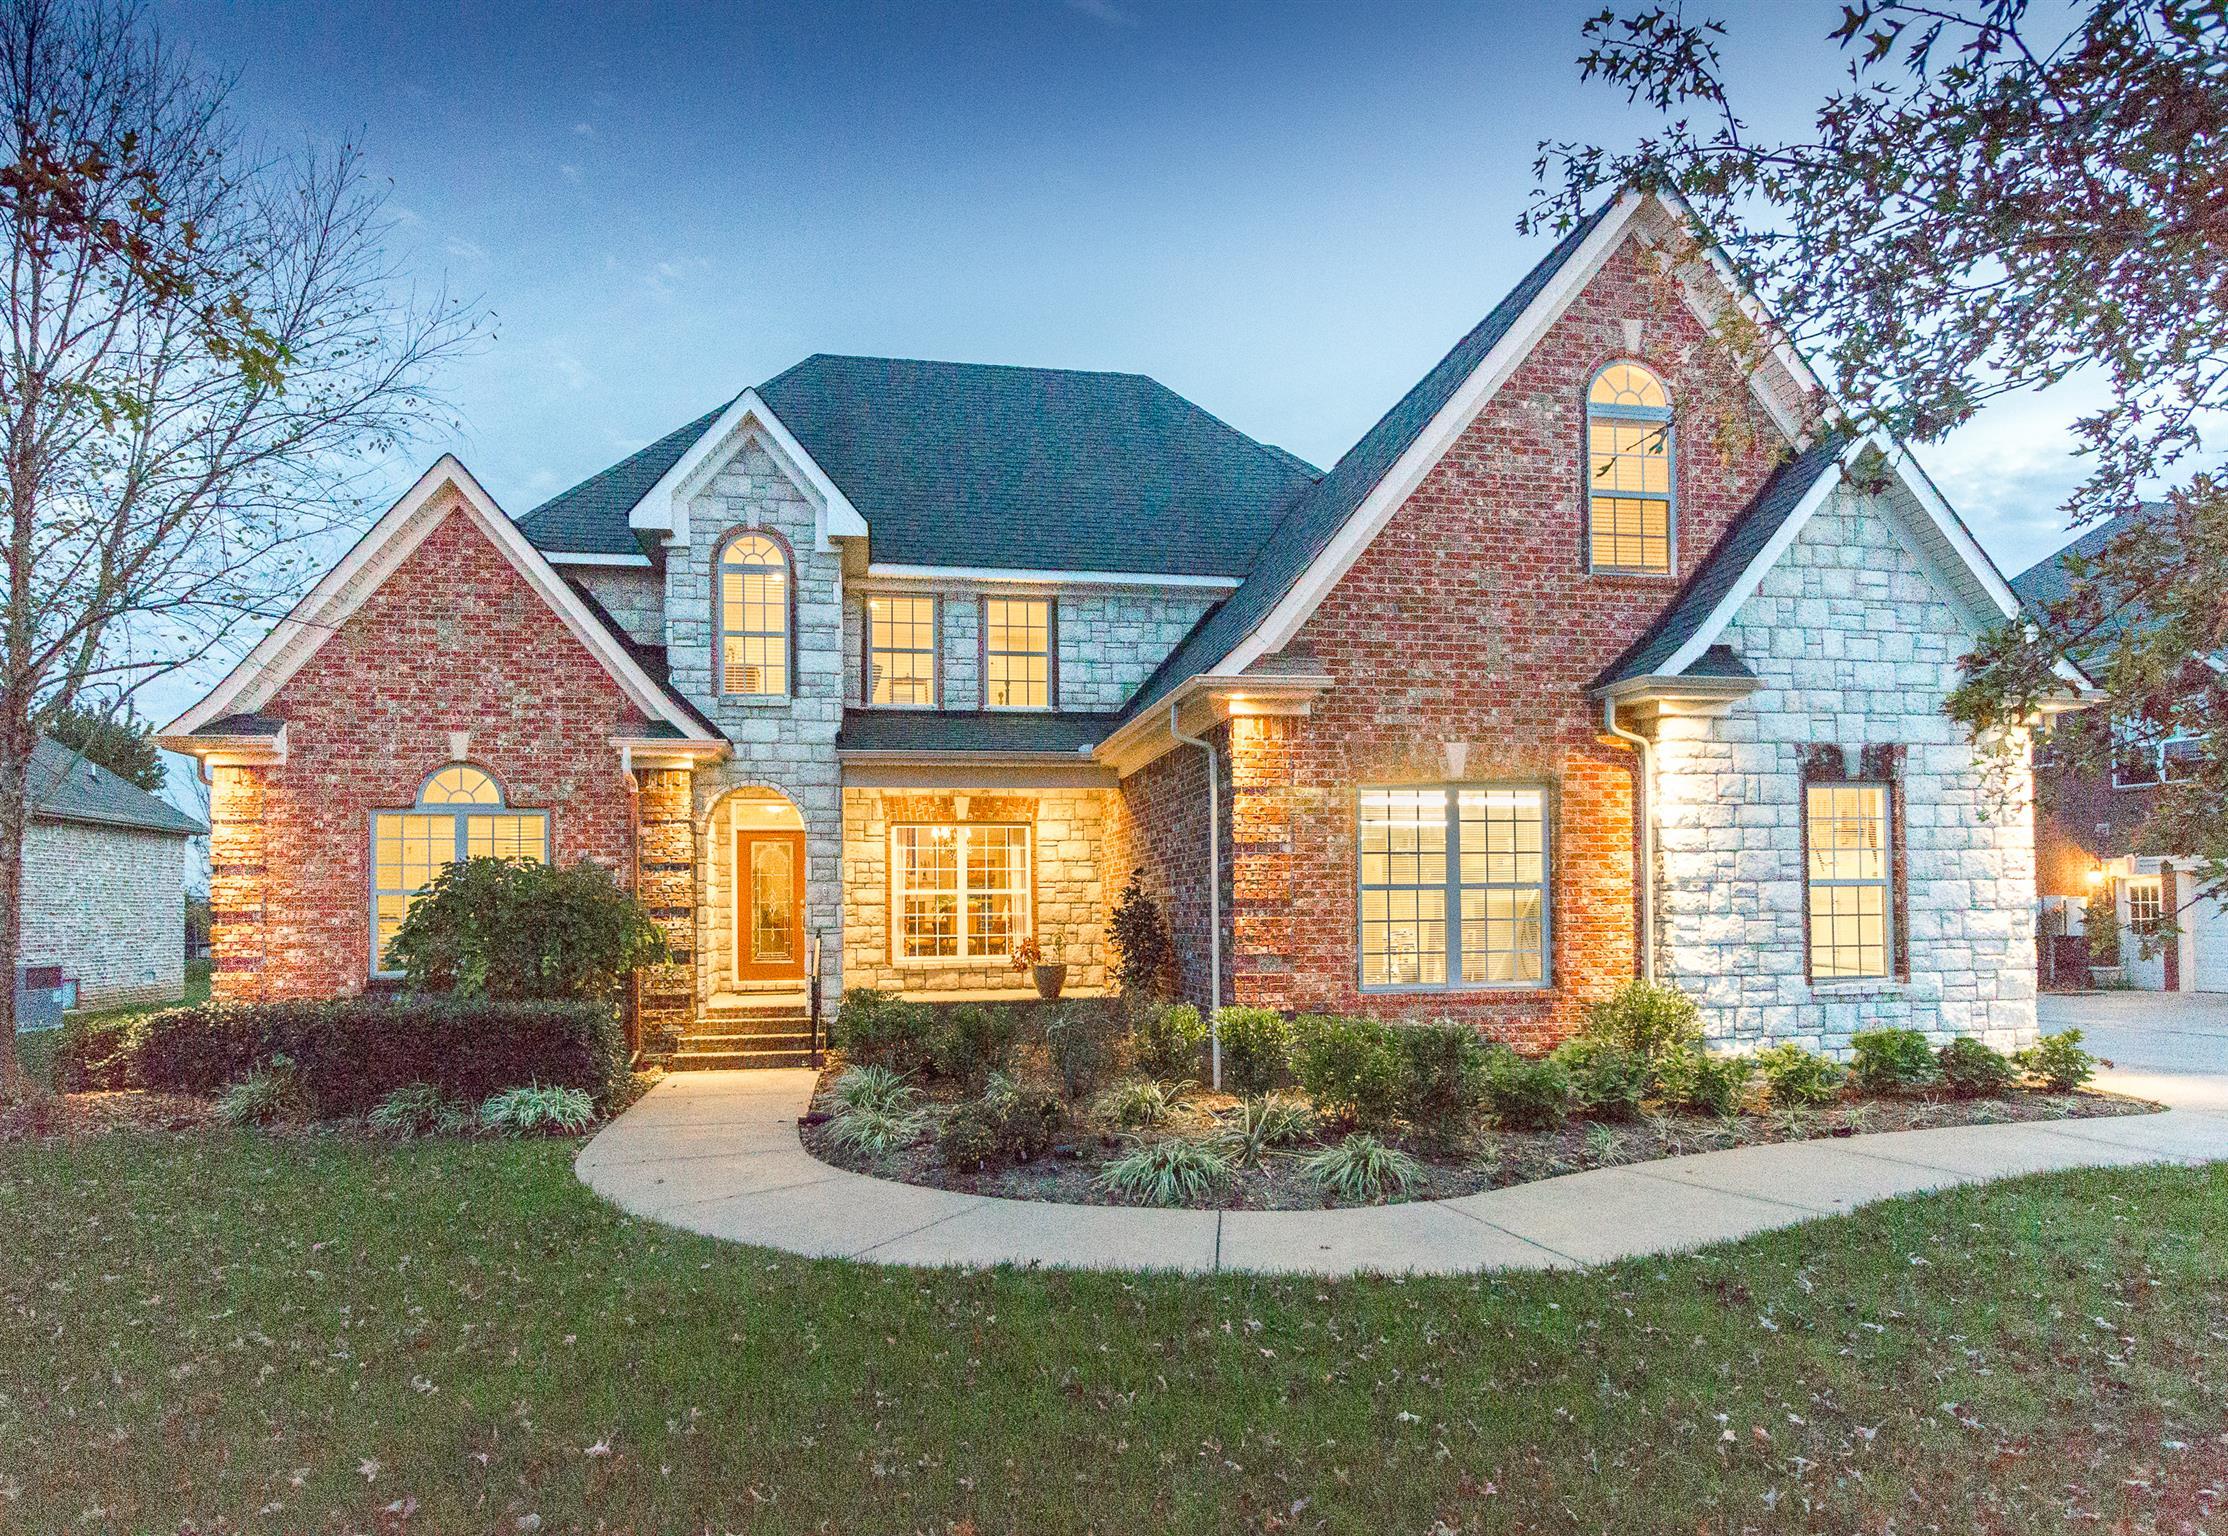 5411 Sherrington Rd, Murfreesboro, TN 37128 - Murfreesboro, TN real estate listing